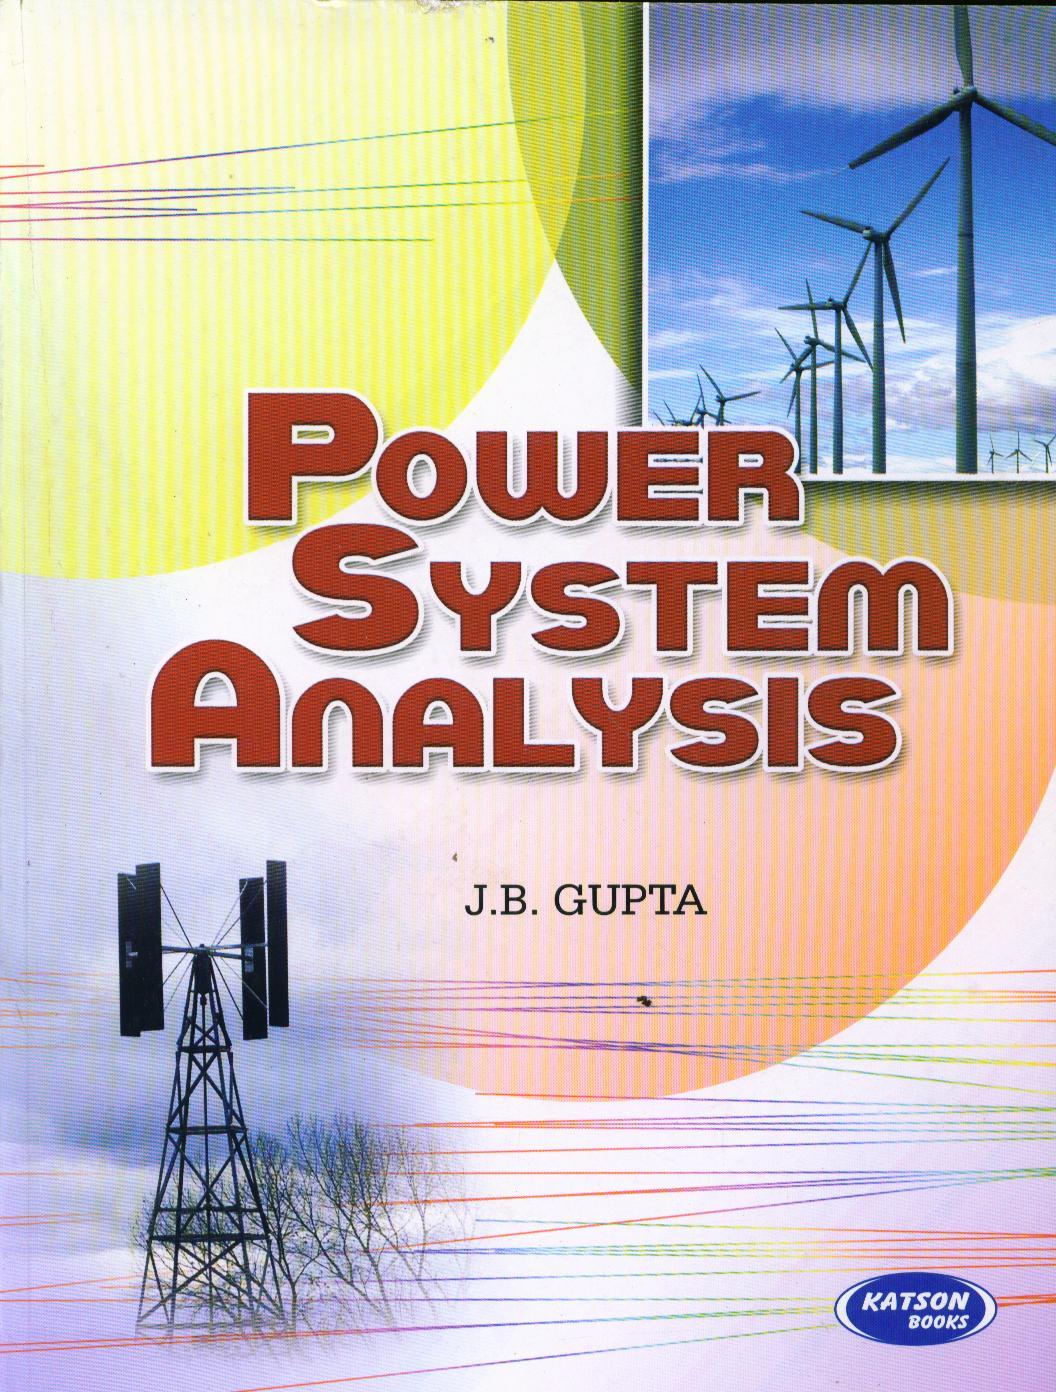 Electrical Engineering Book Pdf By Jb Gupta: Buy Power System Analysis book : Jb Gupta 9350141051 9789350141052 rh:sapnaonline.com,Design